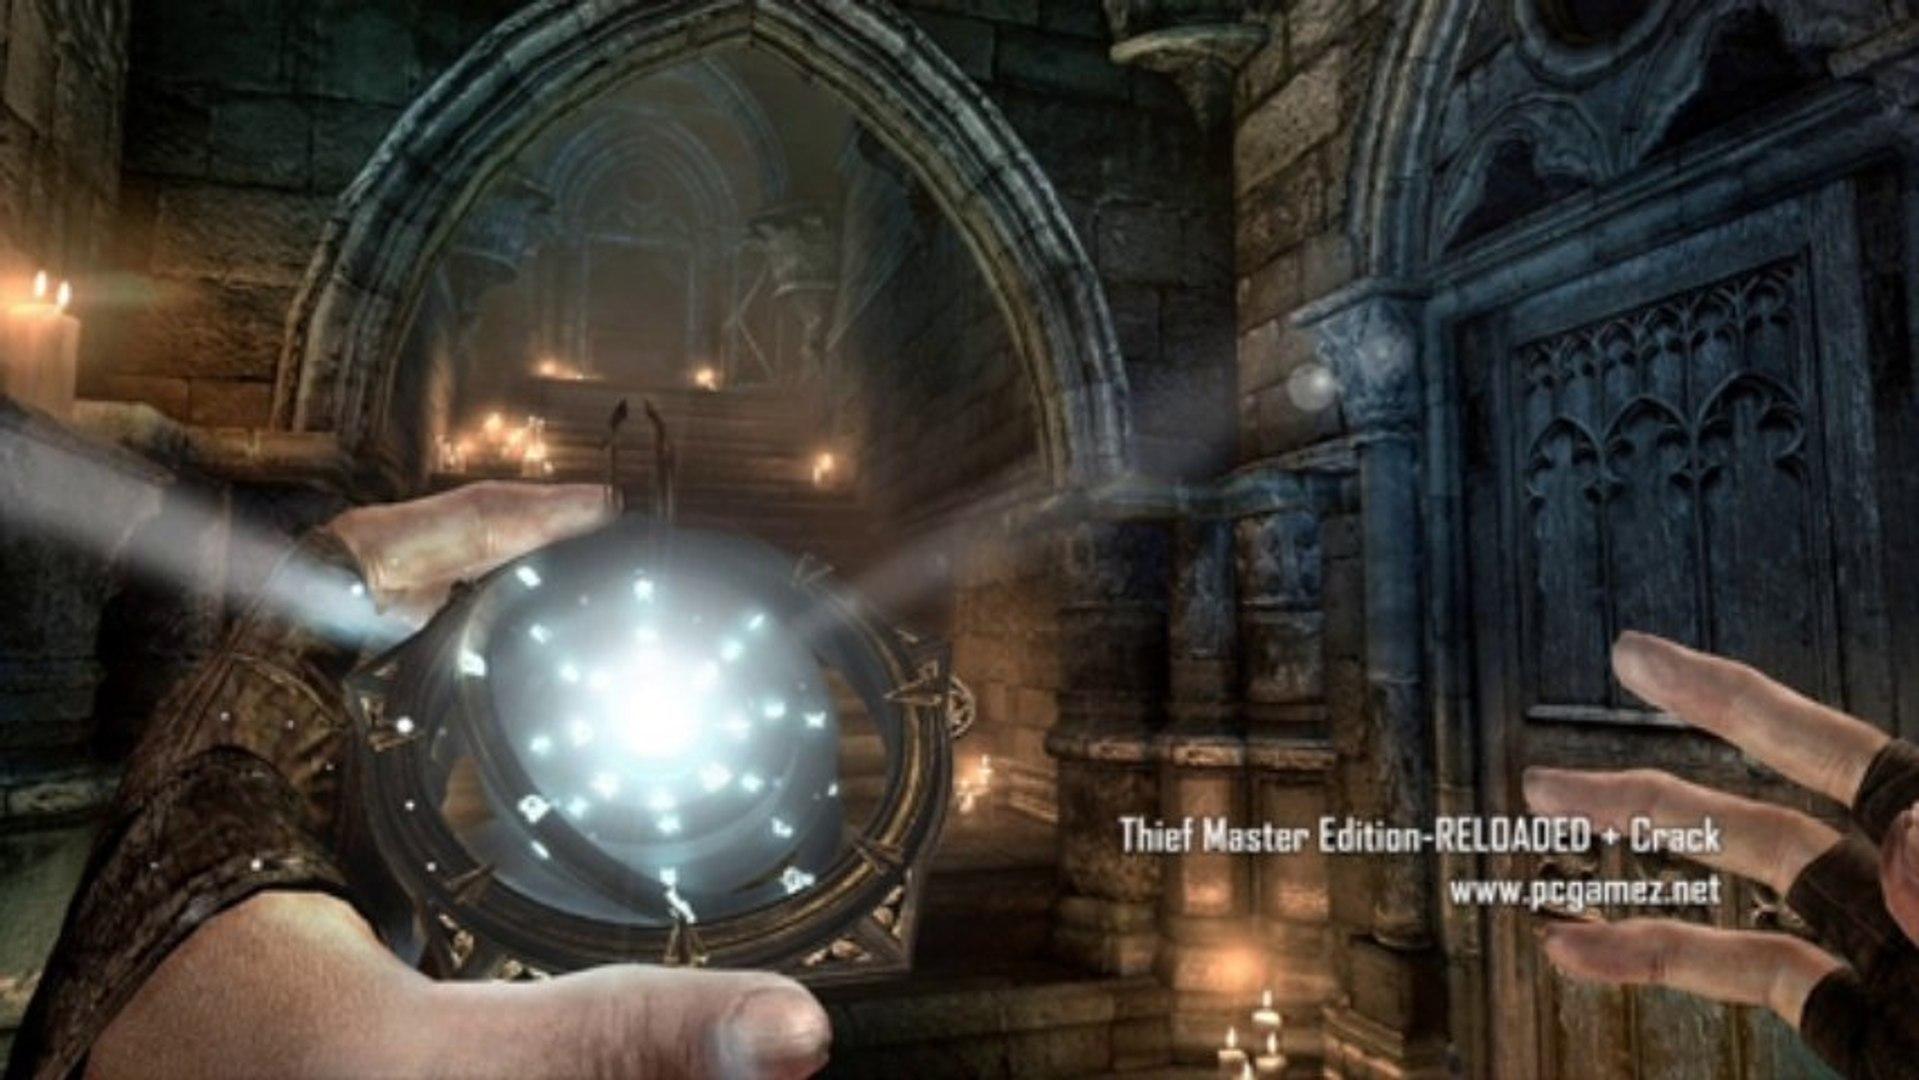 Thief Master Edition PC Game + Crack